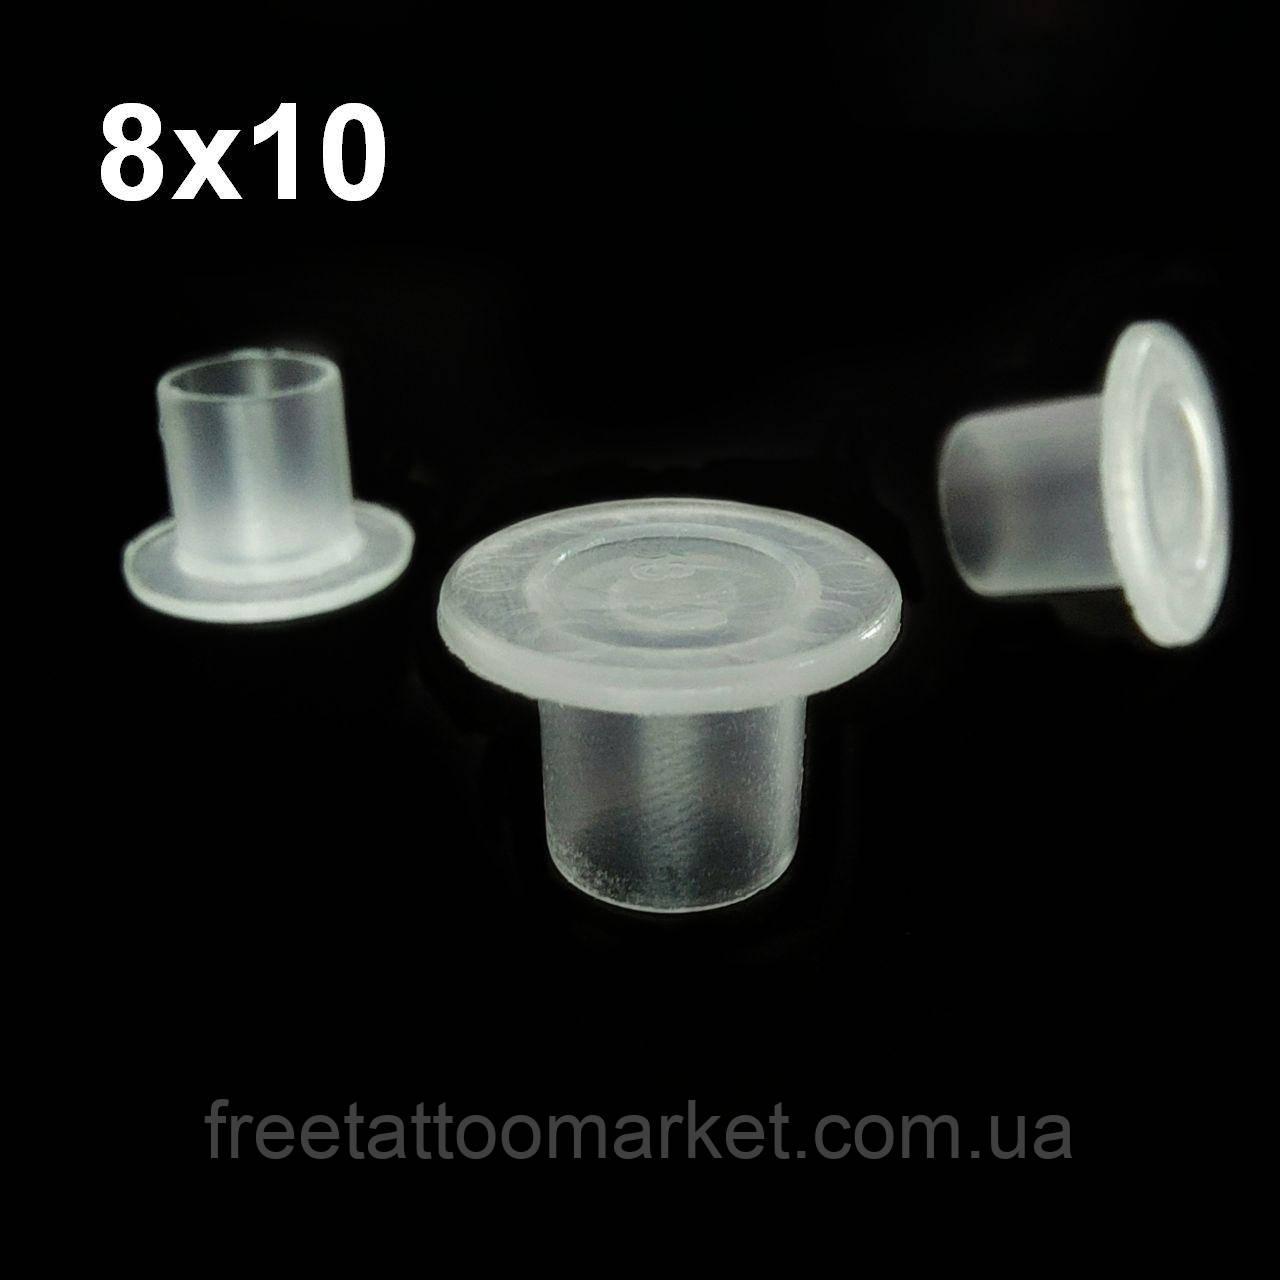 Колпачки для краски с нижним бортом, размер 10мм, диаметр 8мм (500 шт)